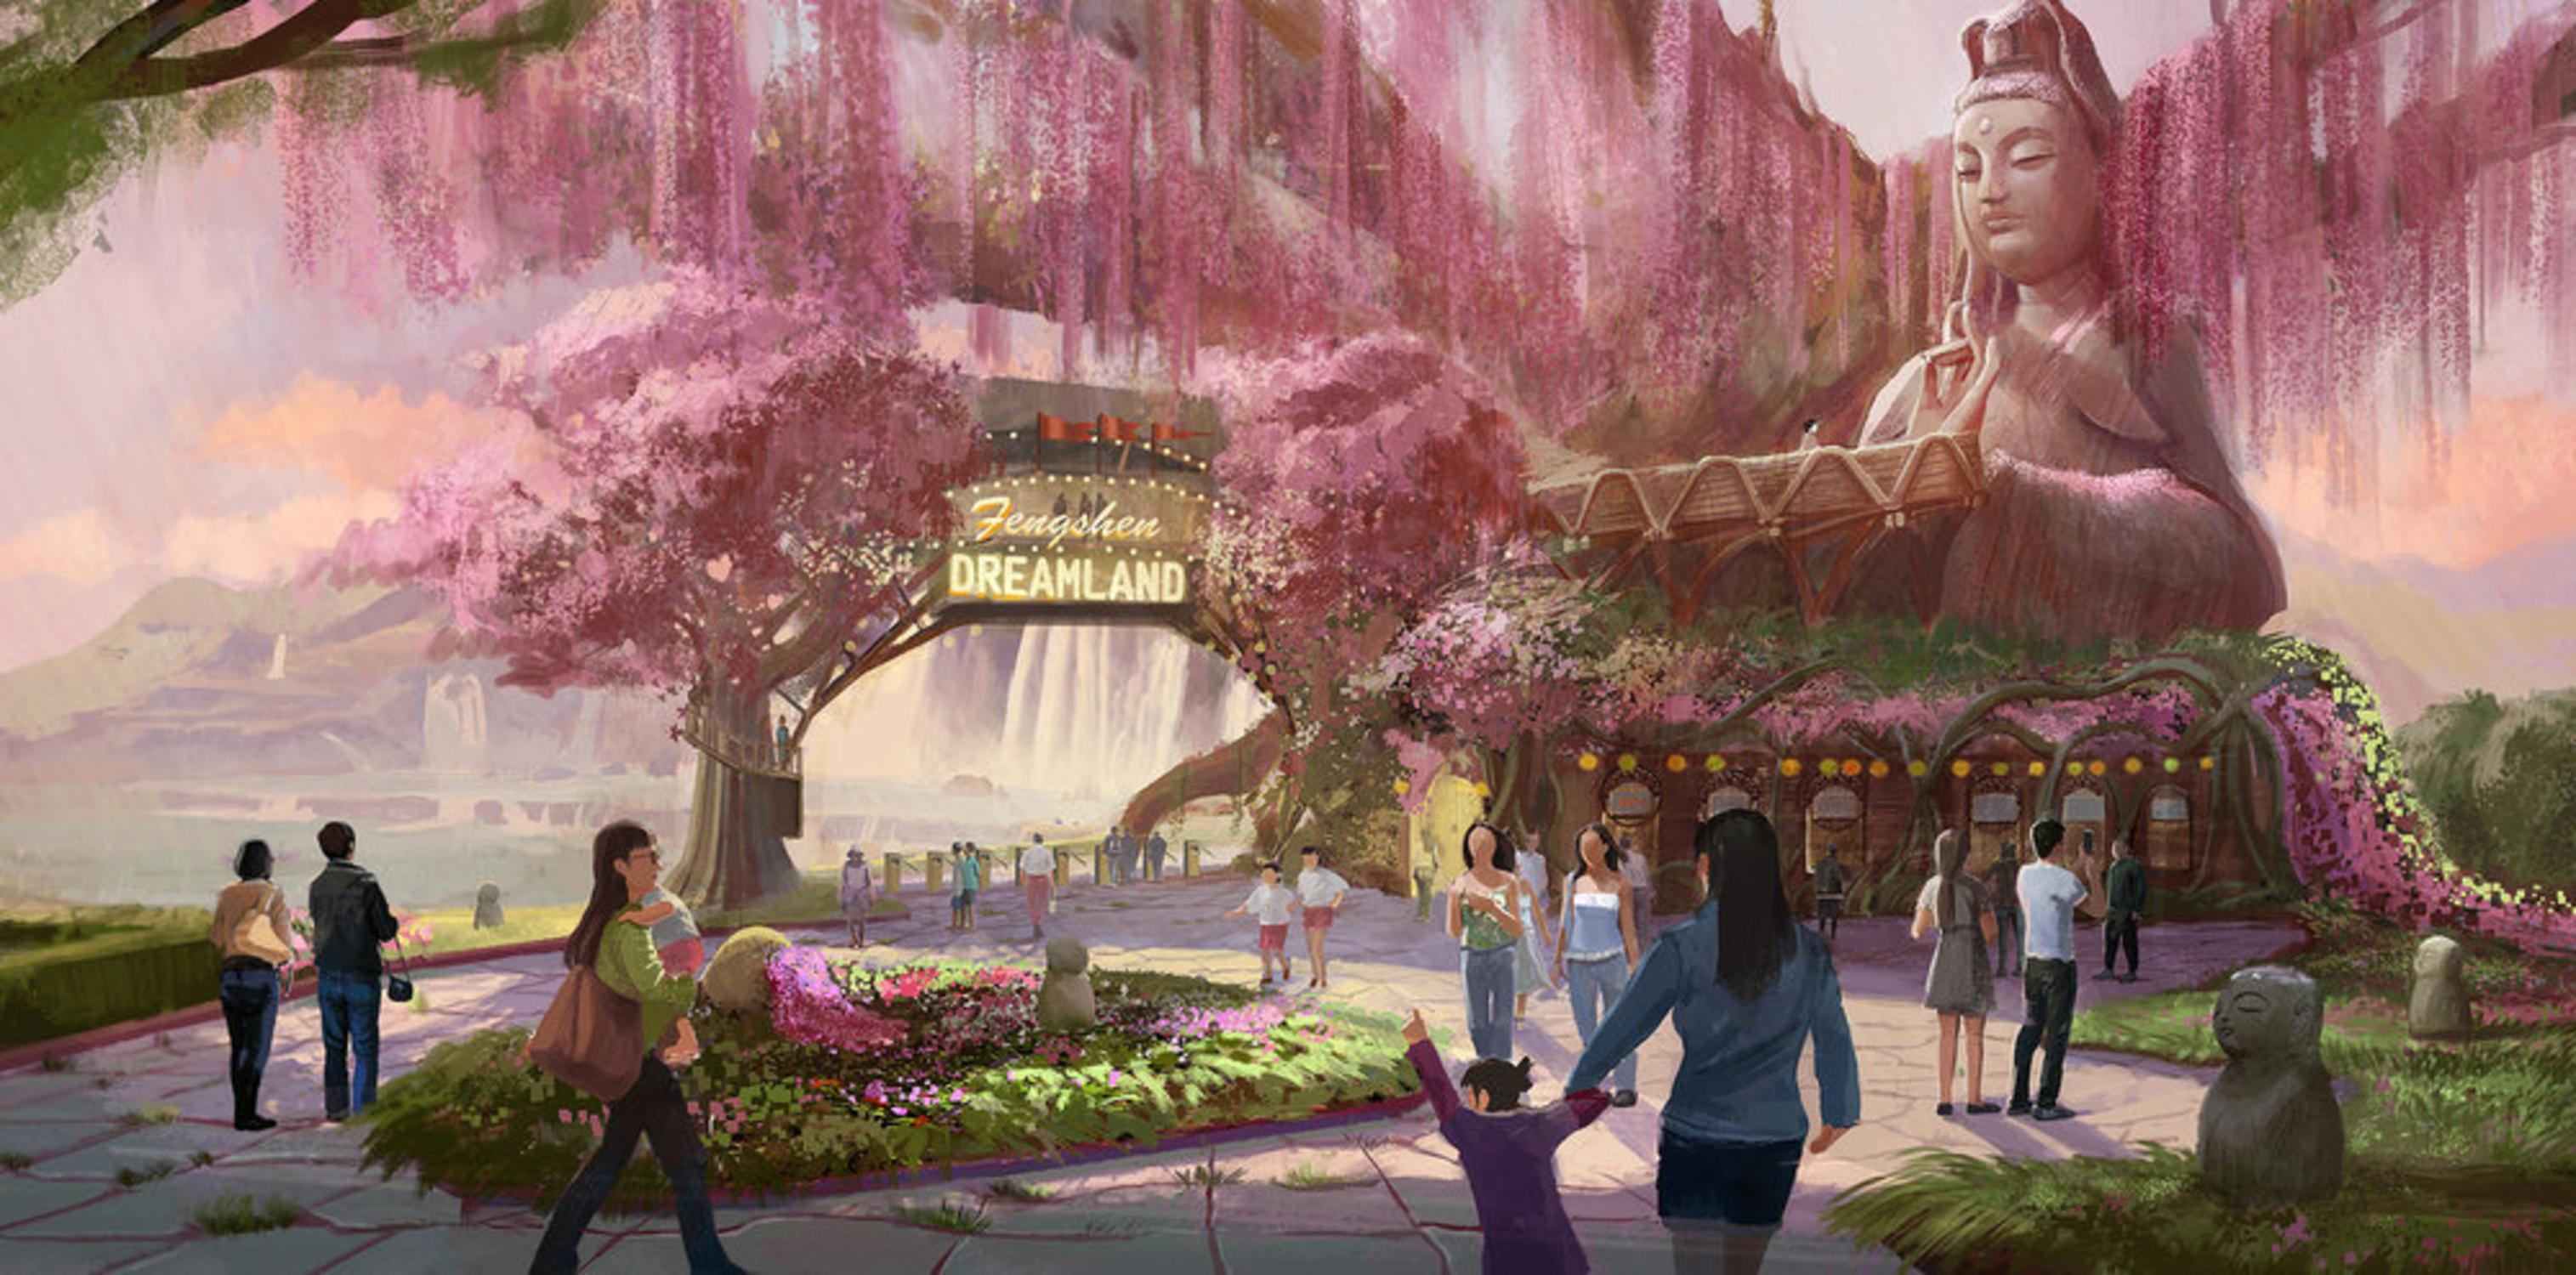 Theme Park Concept Art Artwork by Qianjiao Ma